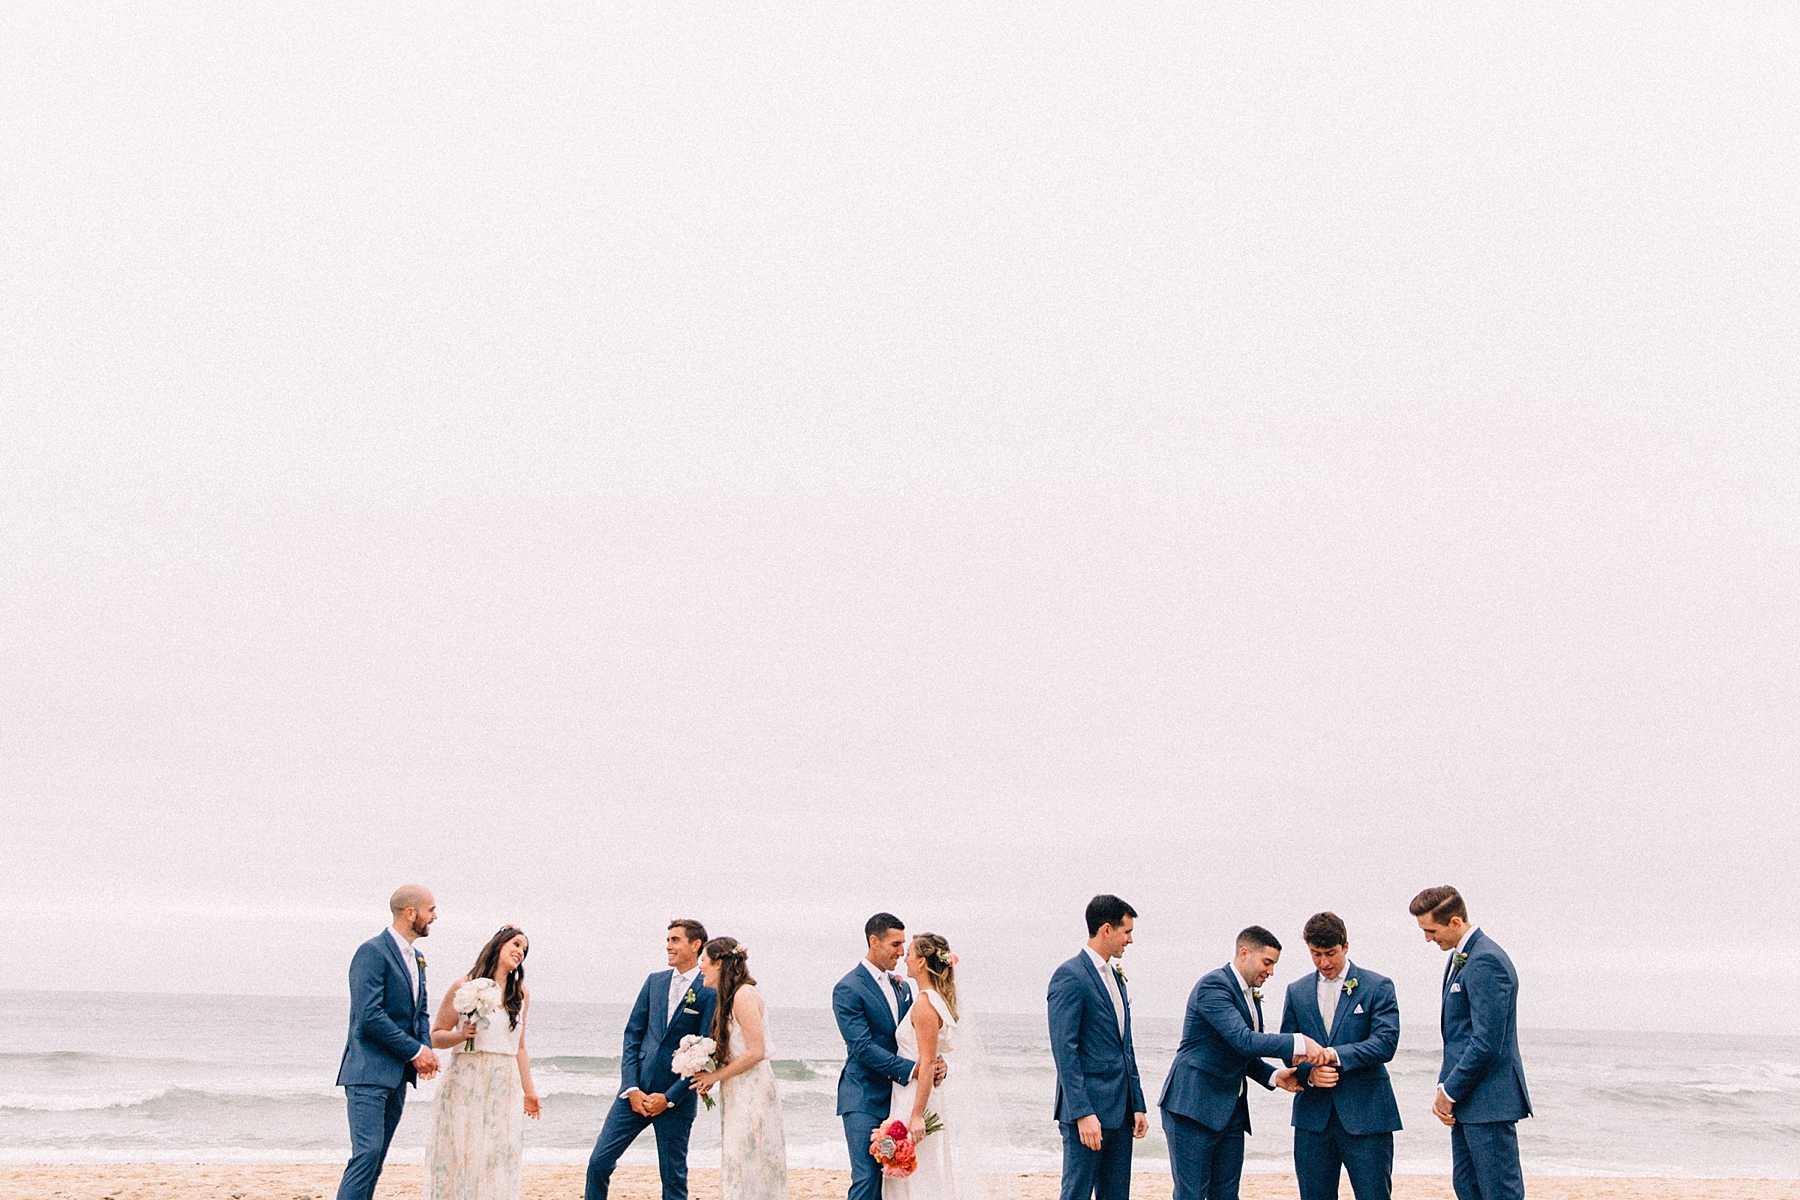 montauk-wedding-photography-rainy-navy-beach_0039.jpg